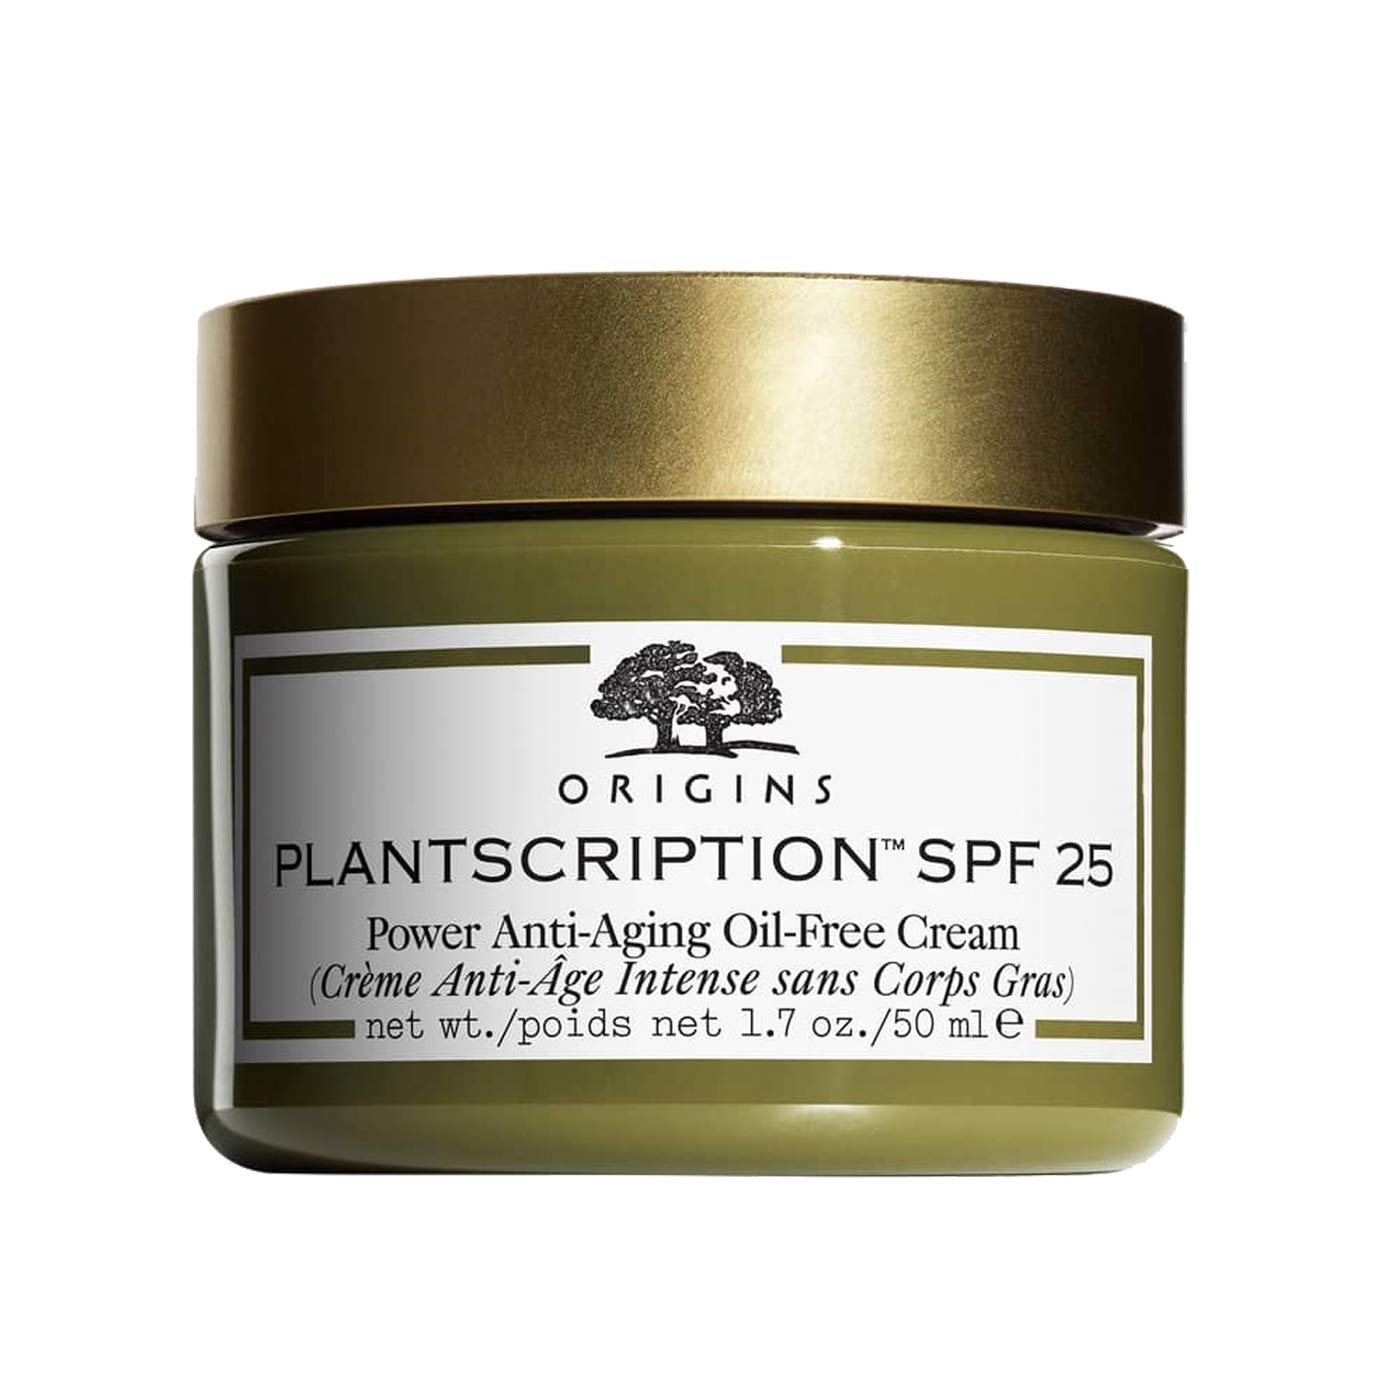 ORIGINS Plantscription SPF 25 Power Anti-Aging Oil-Free Cream 1.7 oz. by Origins